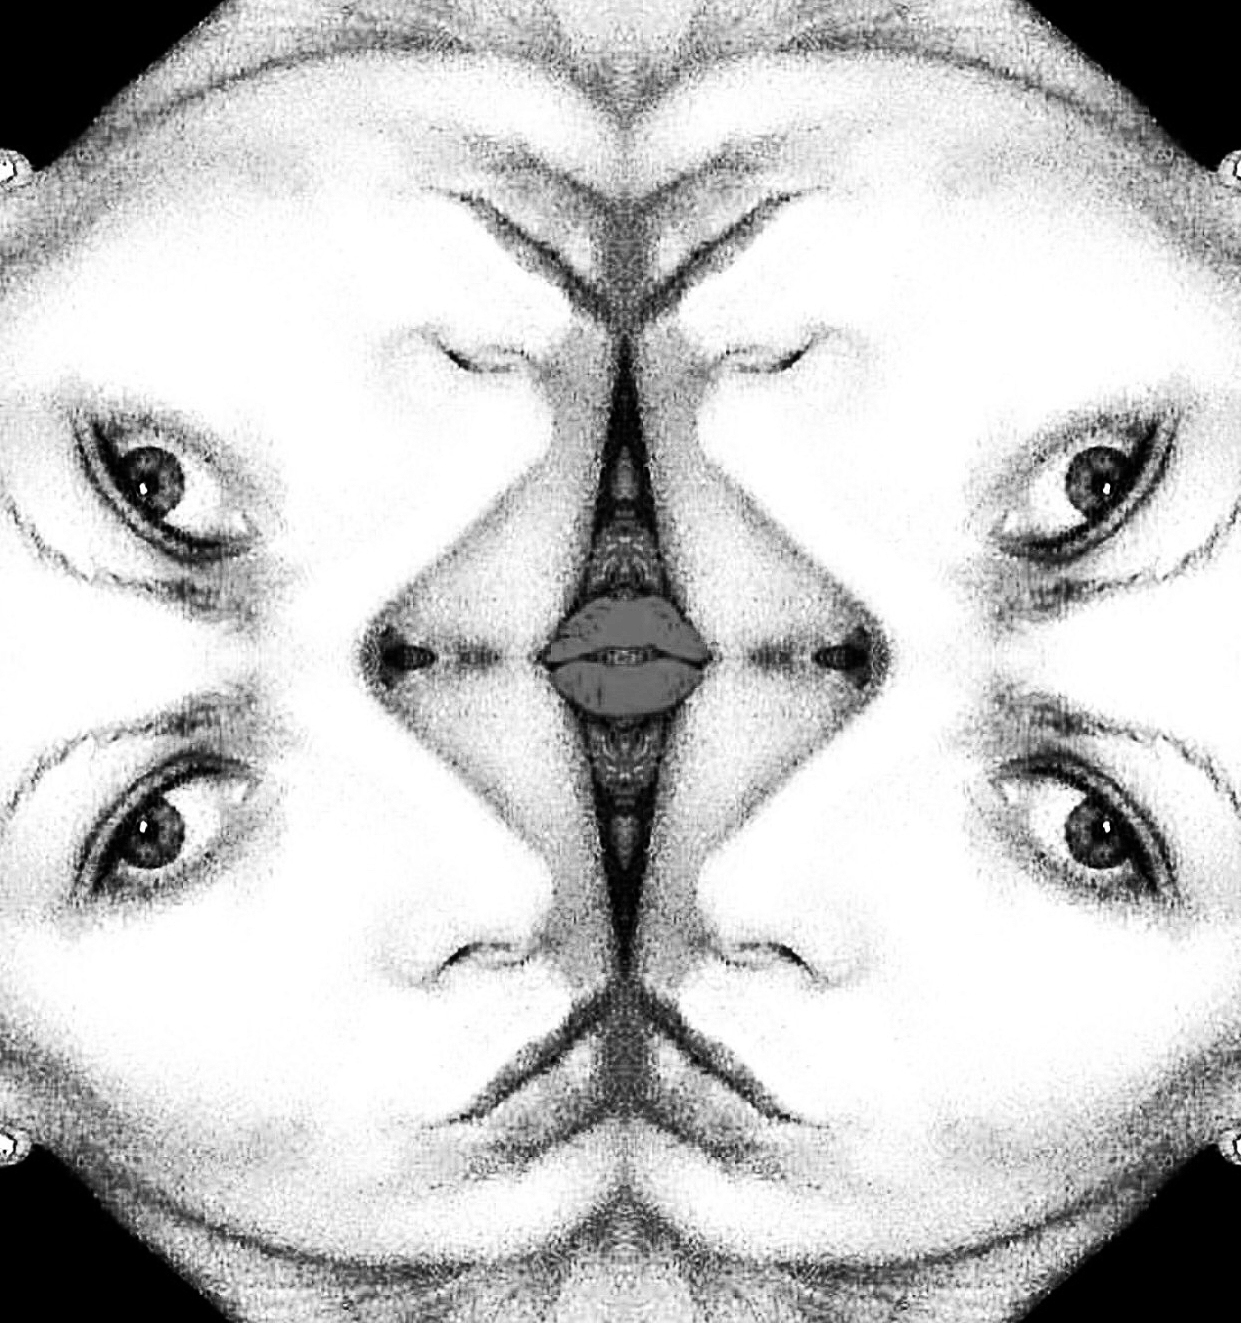 Katie_kerl_self_portraits_backlash_kaliedescope